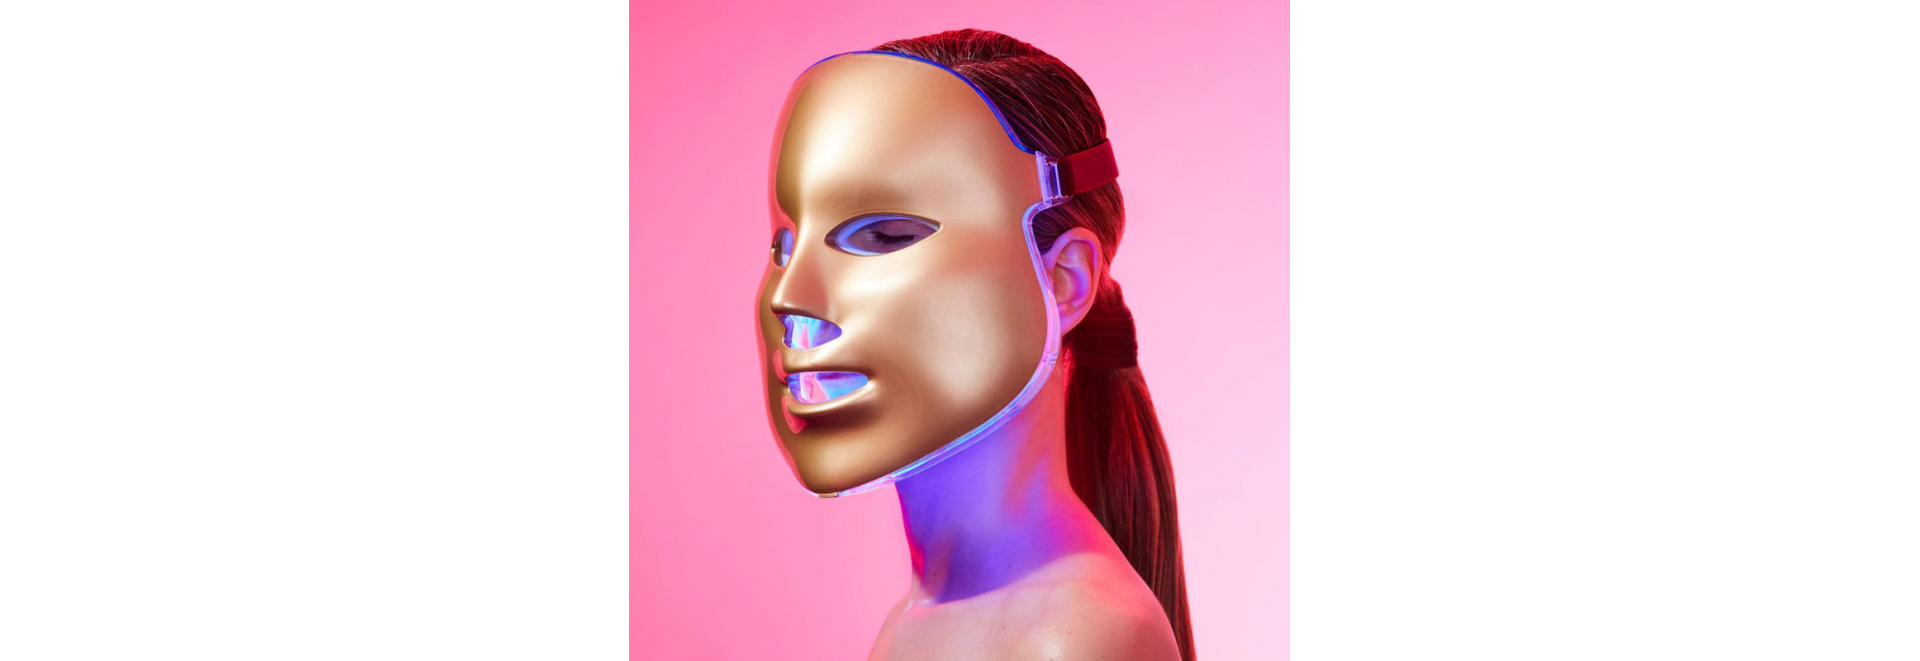 Photothérapie anti-âge - masque de luminothérapie - Medi-Lum